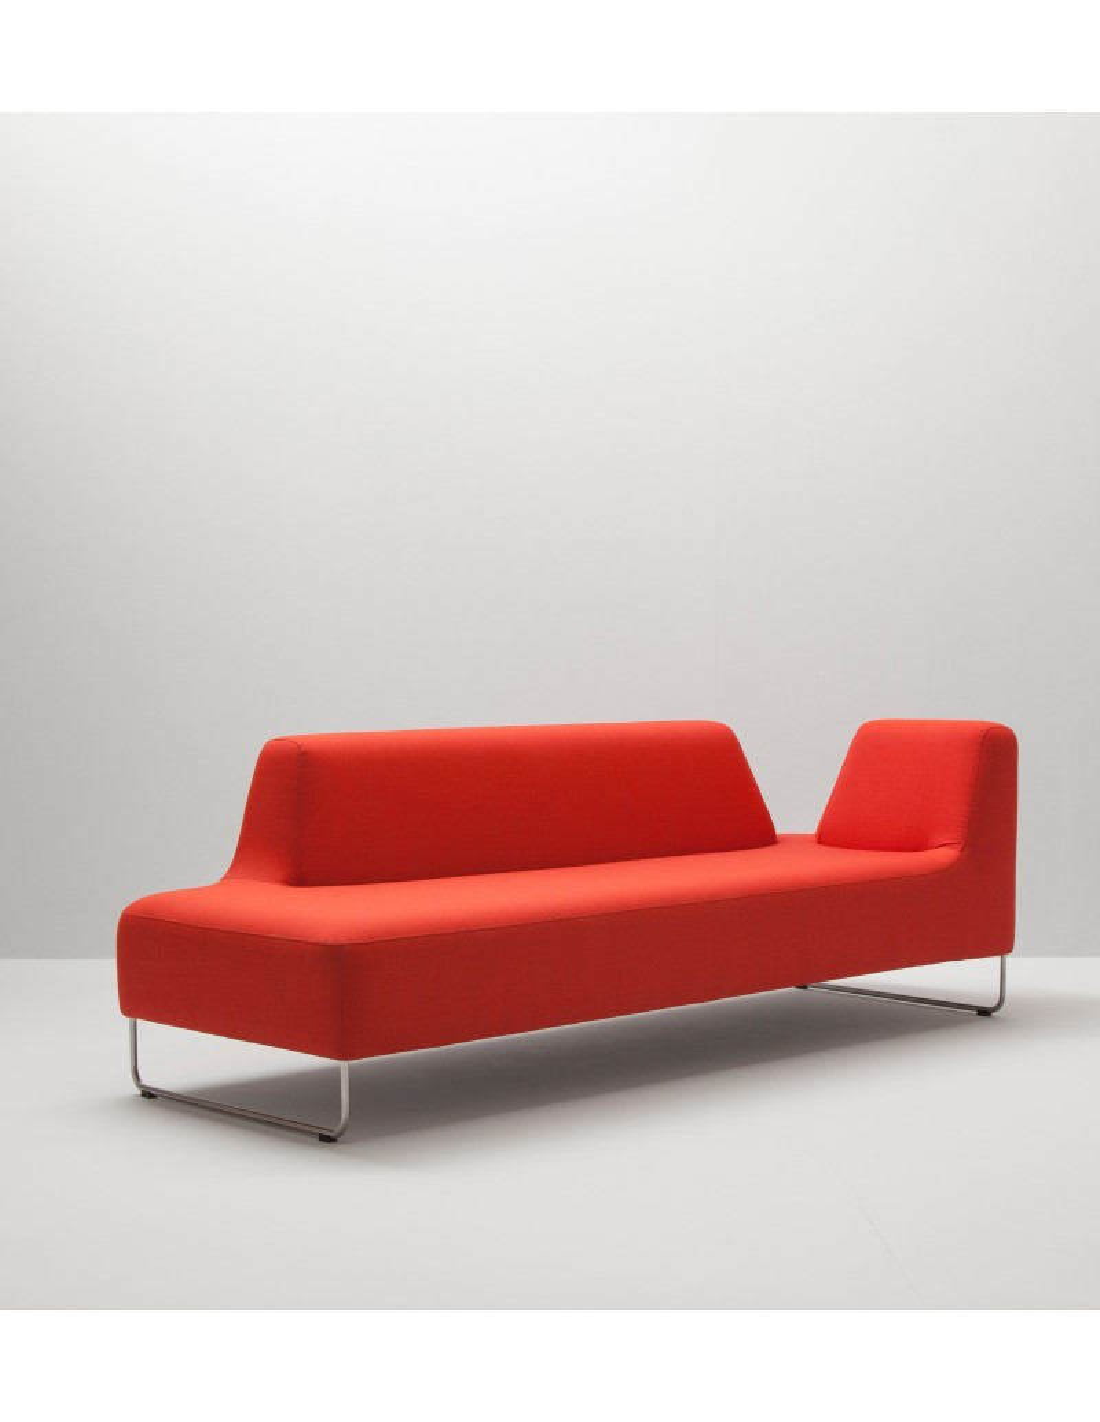 Modular Sofa Ugo By Norway Says For Lk Hjelle